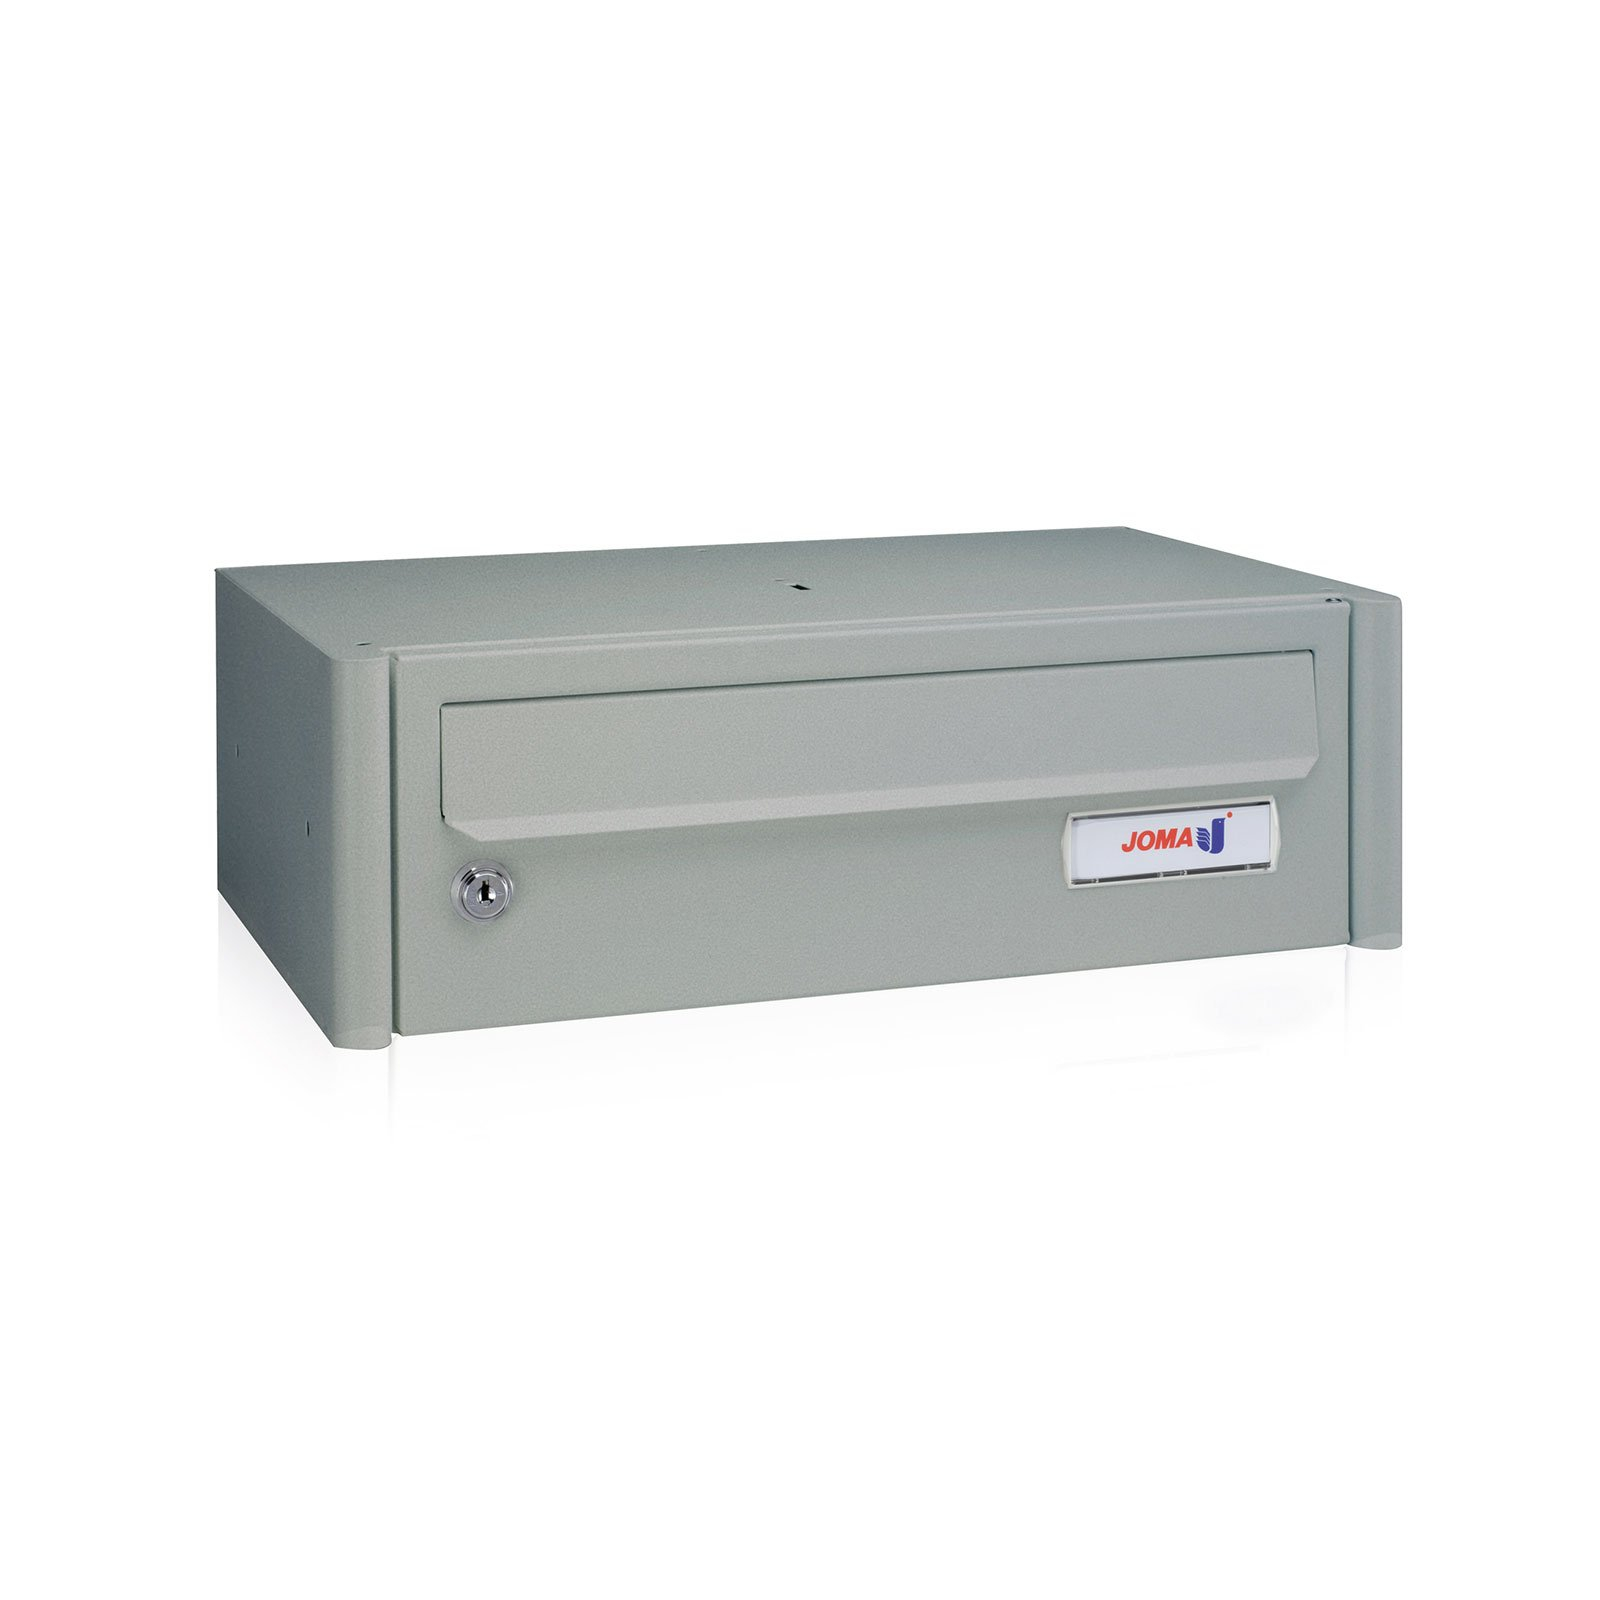 Joma brievenbussysteem Column H-404